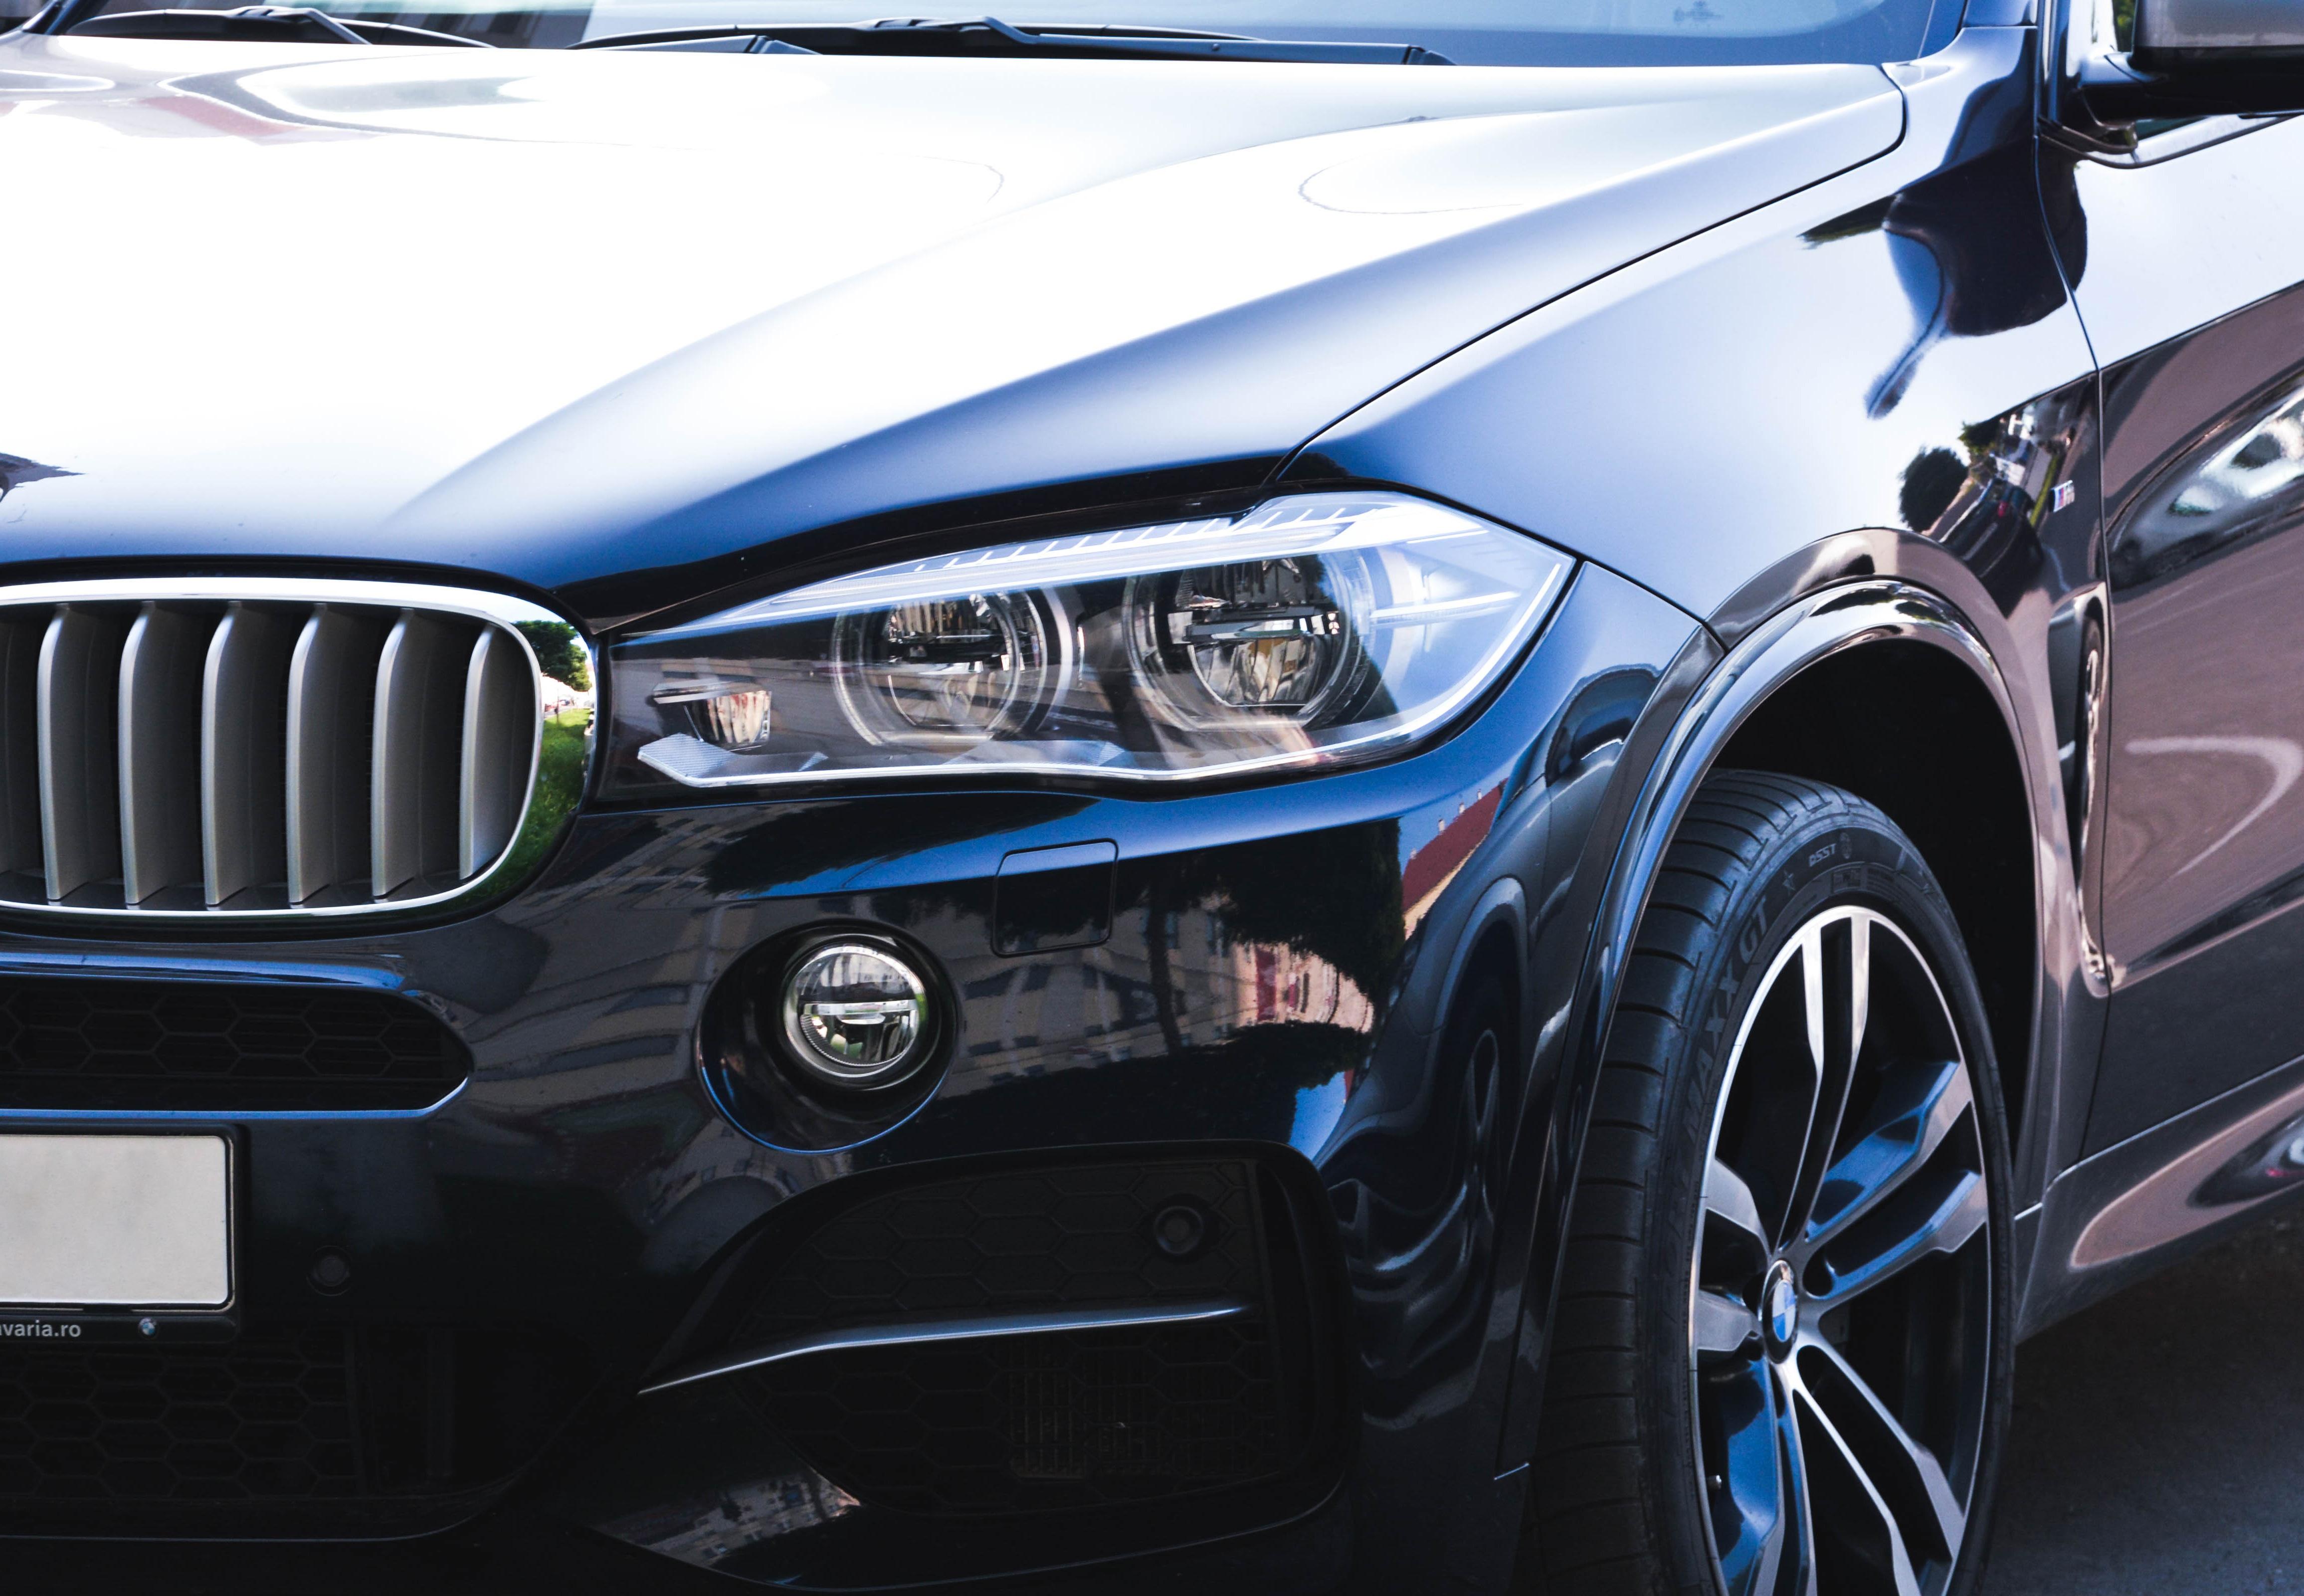 Free Images : car, wheel, grille, bumper, rim, sport utility vehicle ...